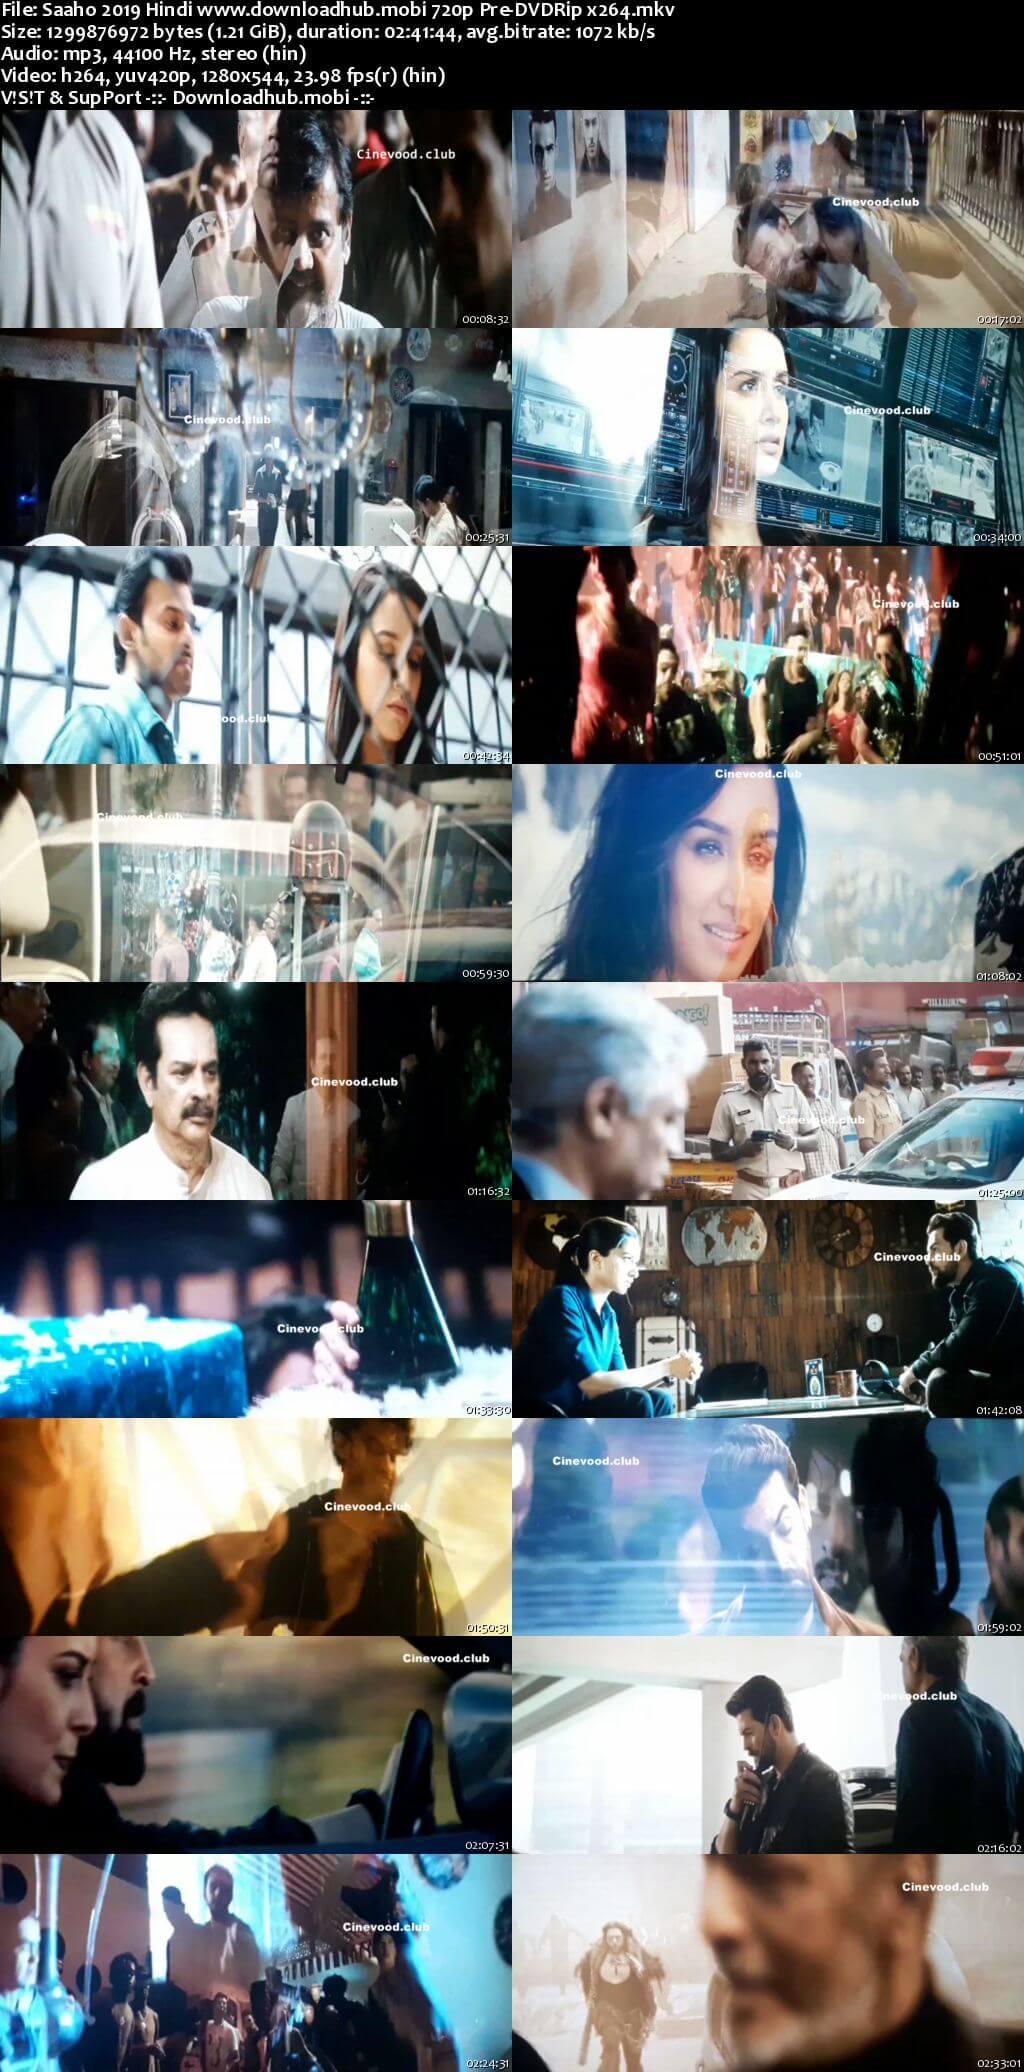 Saaho 2019 Hindi 720p Pre-DVDRip x264